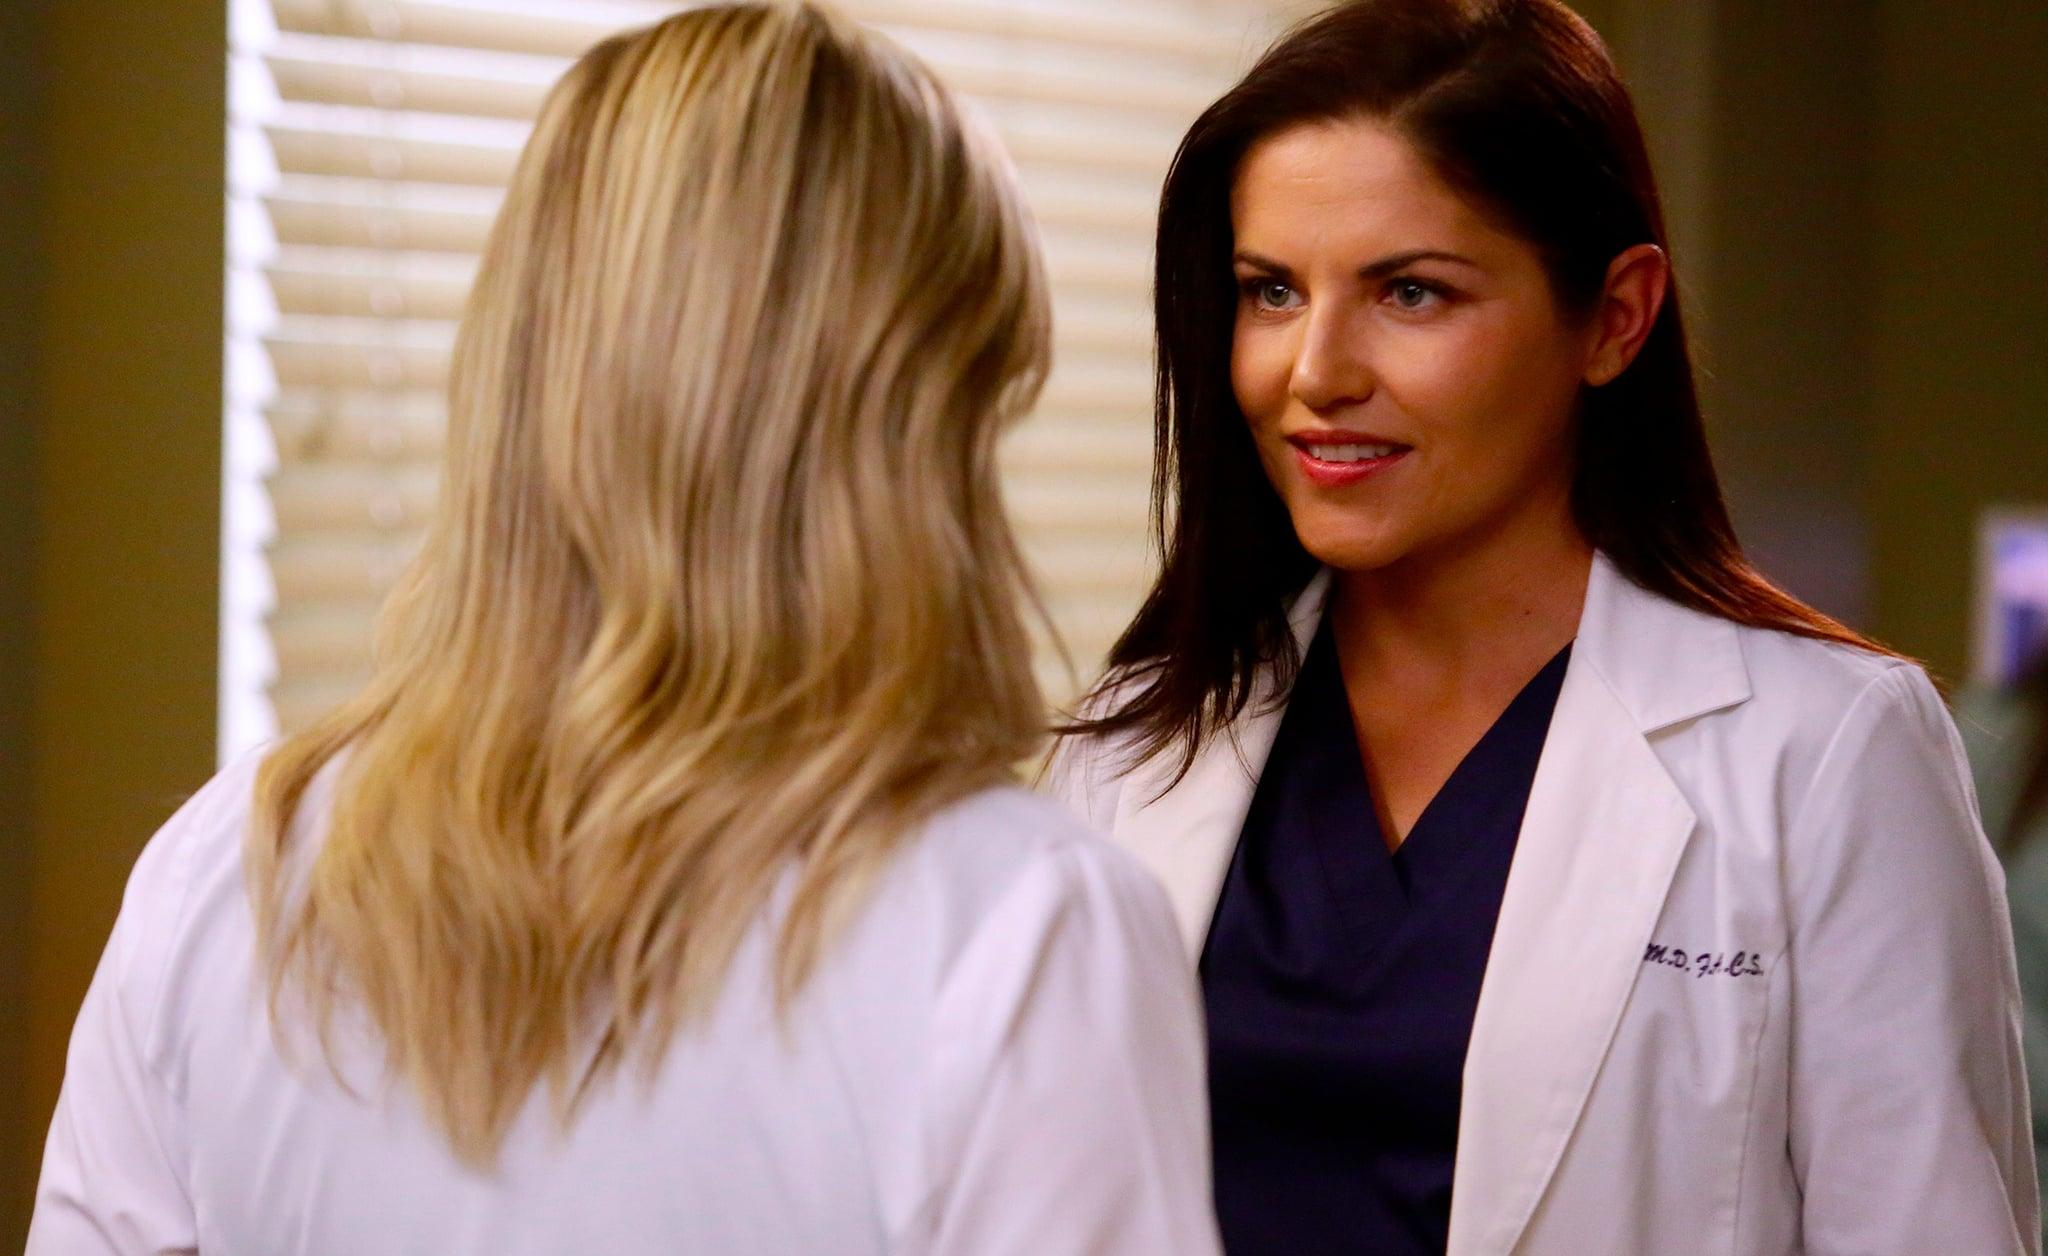 Jessica Capshaw on Her New Grey's Anatomy Love Interest